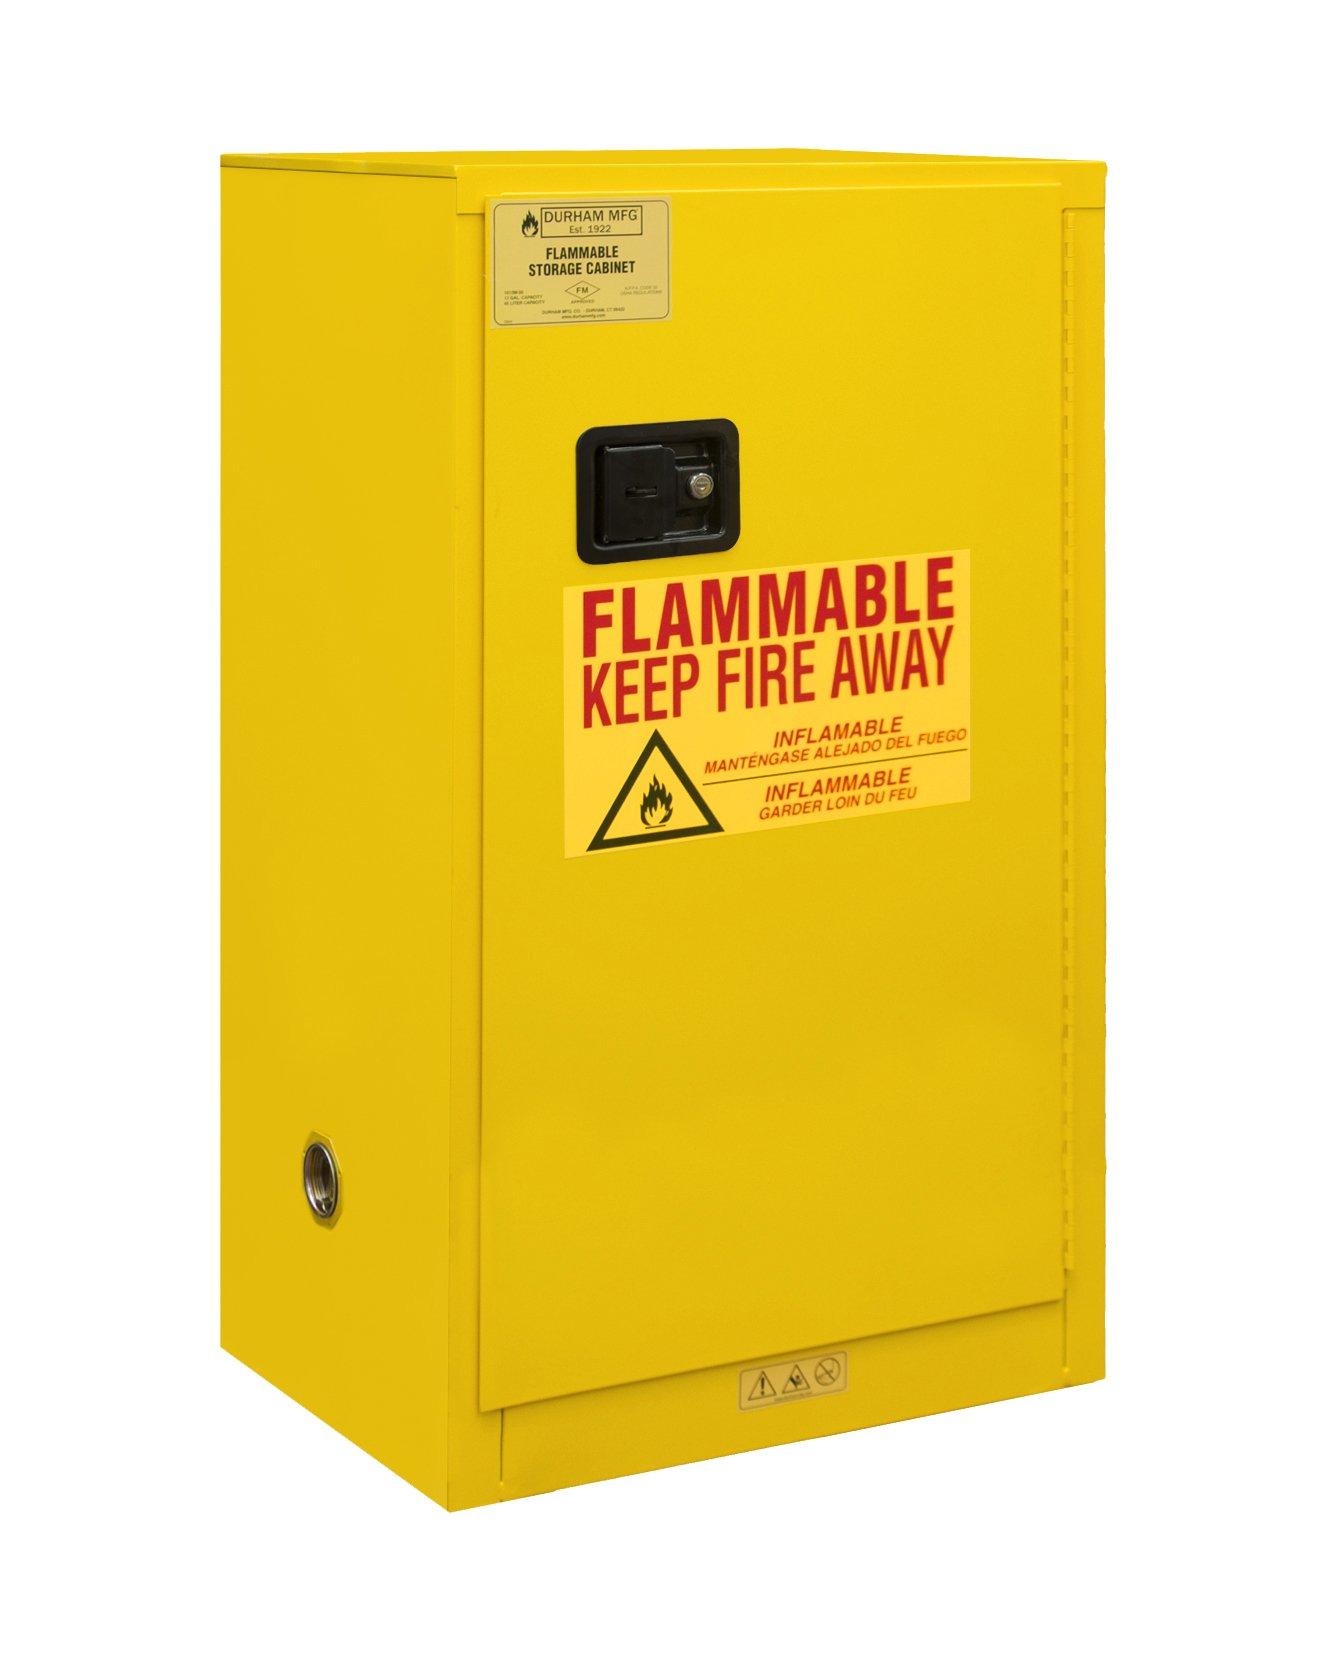 Durham 1016M-50 Welded 16 Gauge Steel Flammable Safety Manual Door Cabinet, 1 Shelf, 16 gal Capacity, 18'' Length x 23'' Width x 44'' Height, Yellow Powder Coat Finish